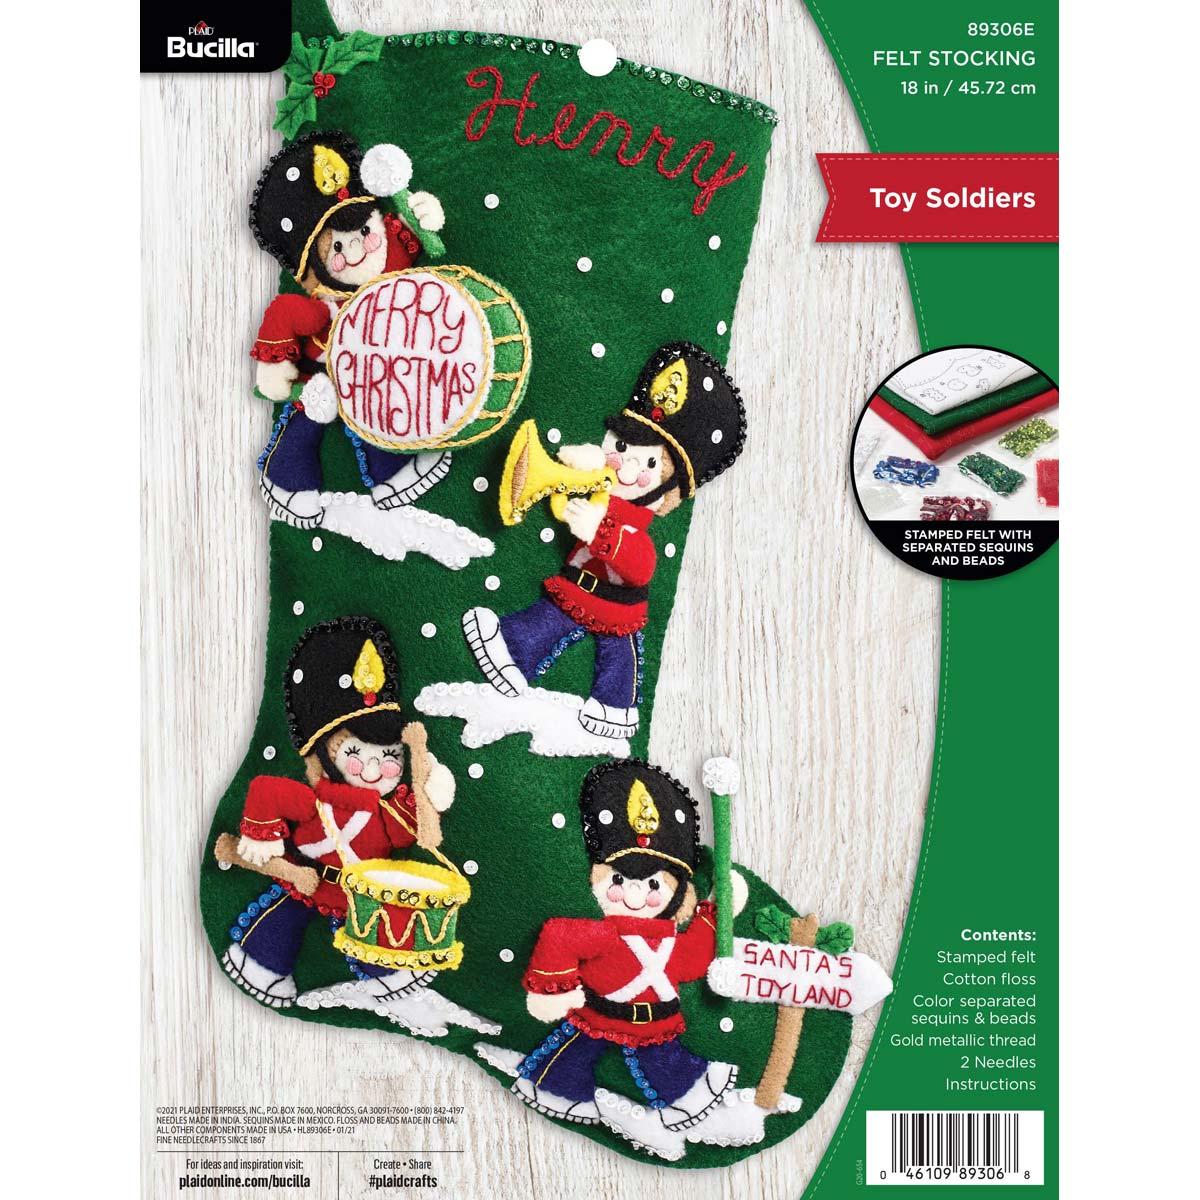 Bucilla ® Seasonal - Felt - Stocking Kits - Toy Soldiers - 89306E